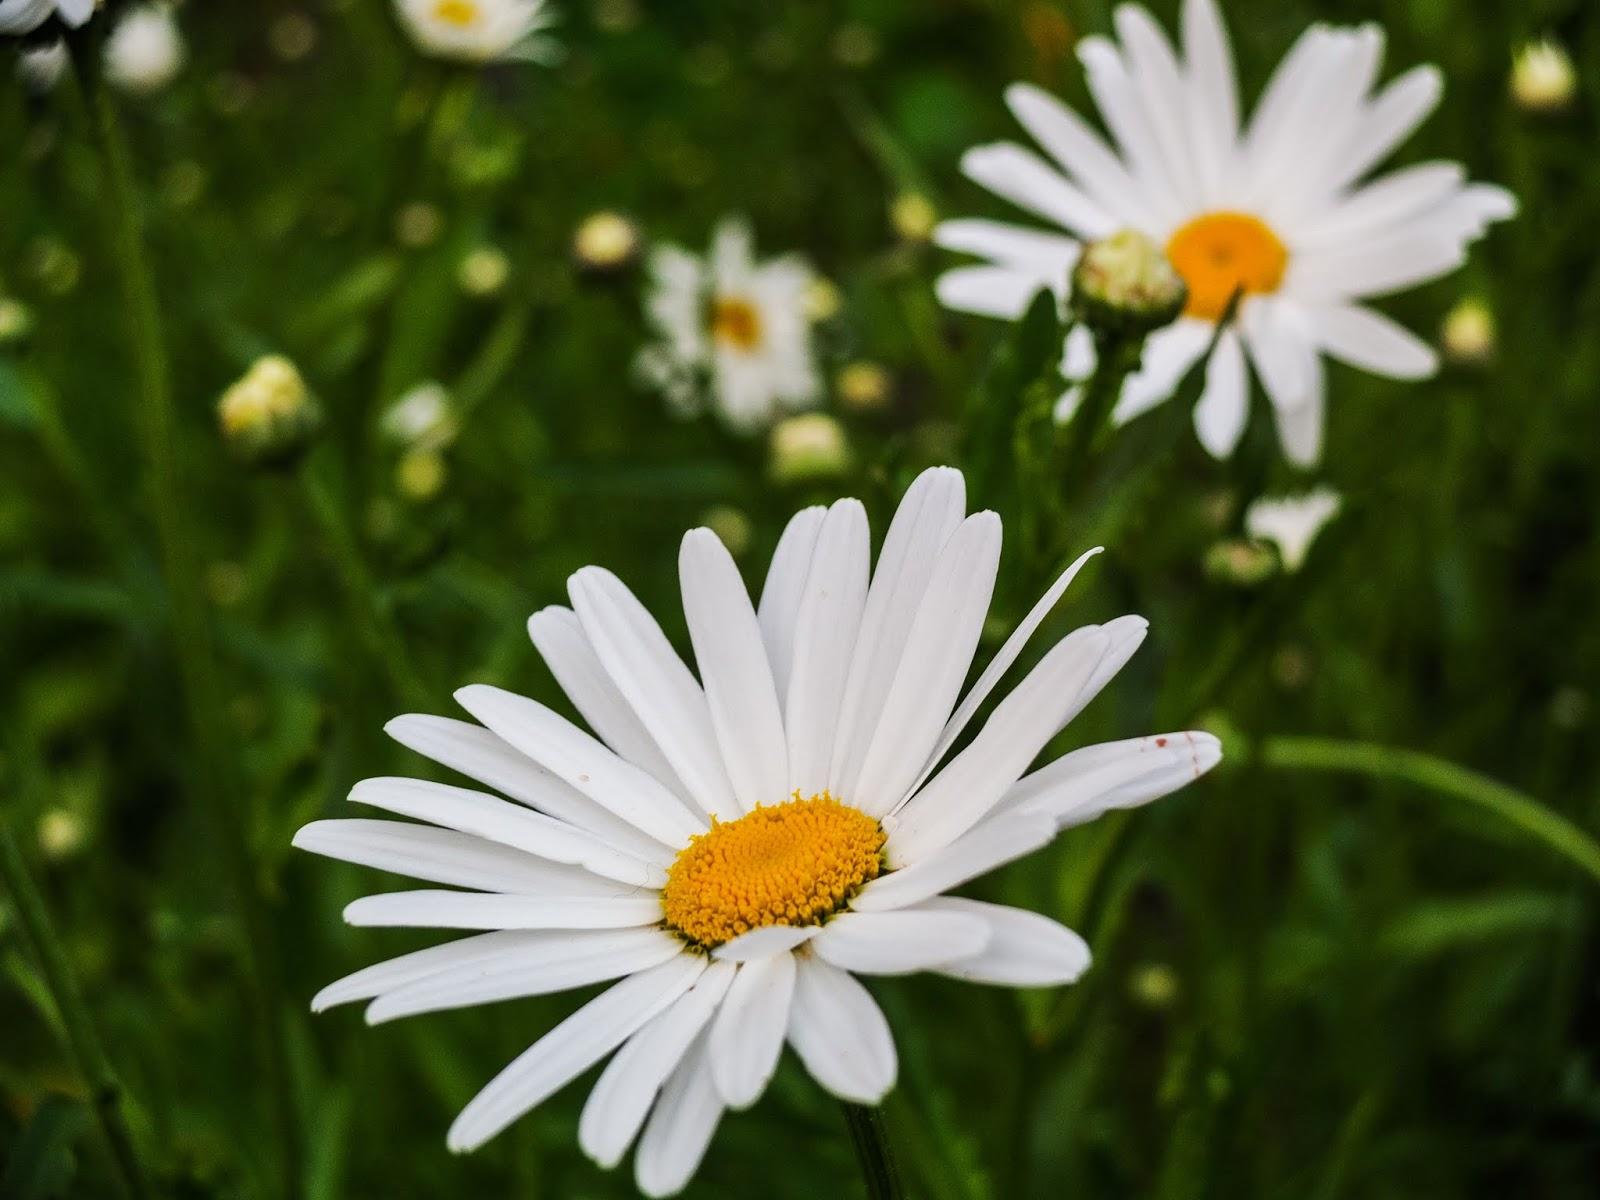 Tall, white daisy flower meadow.